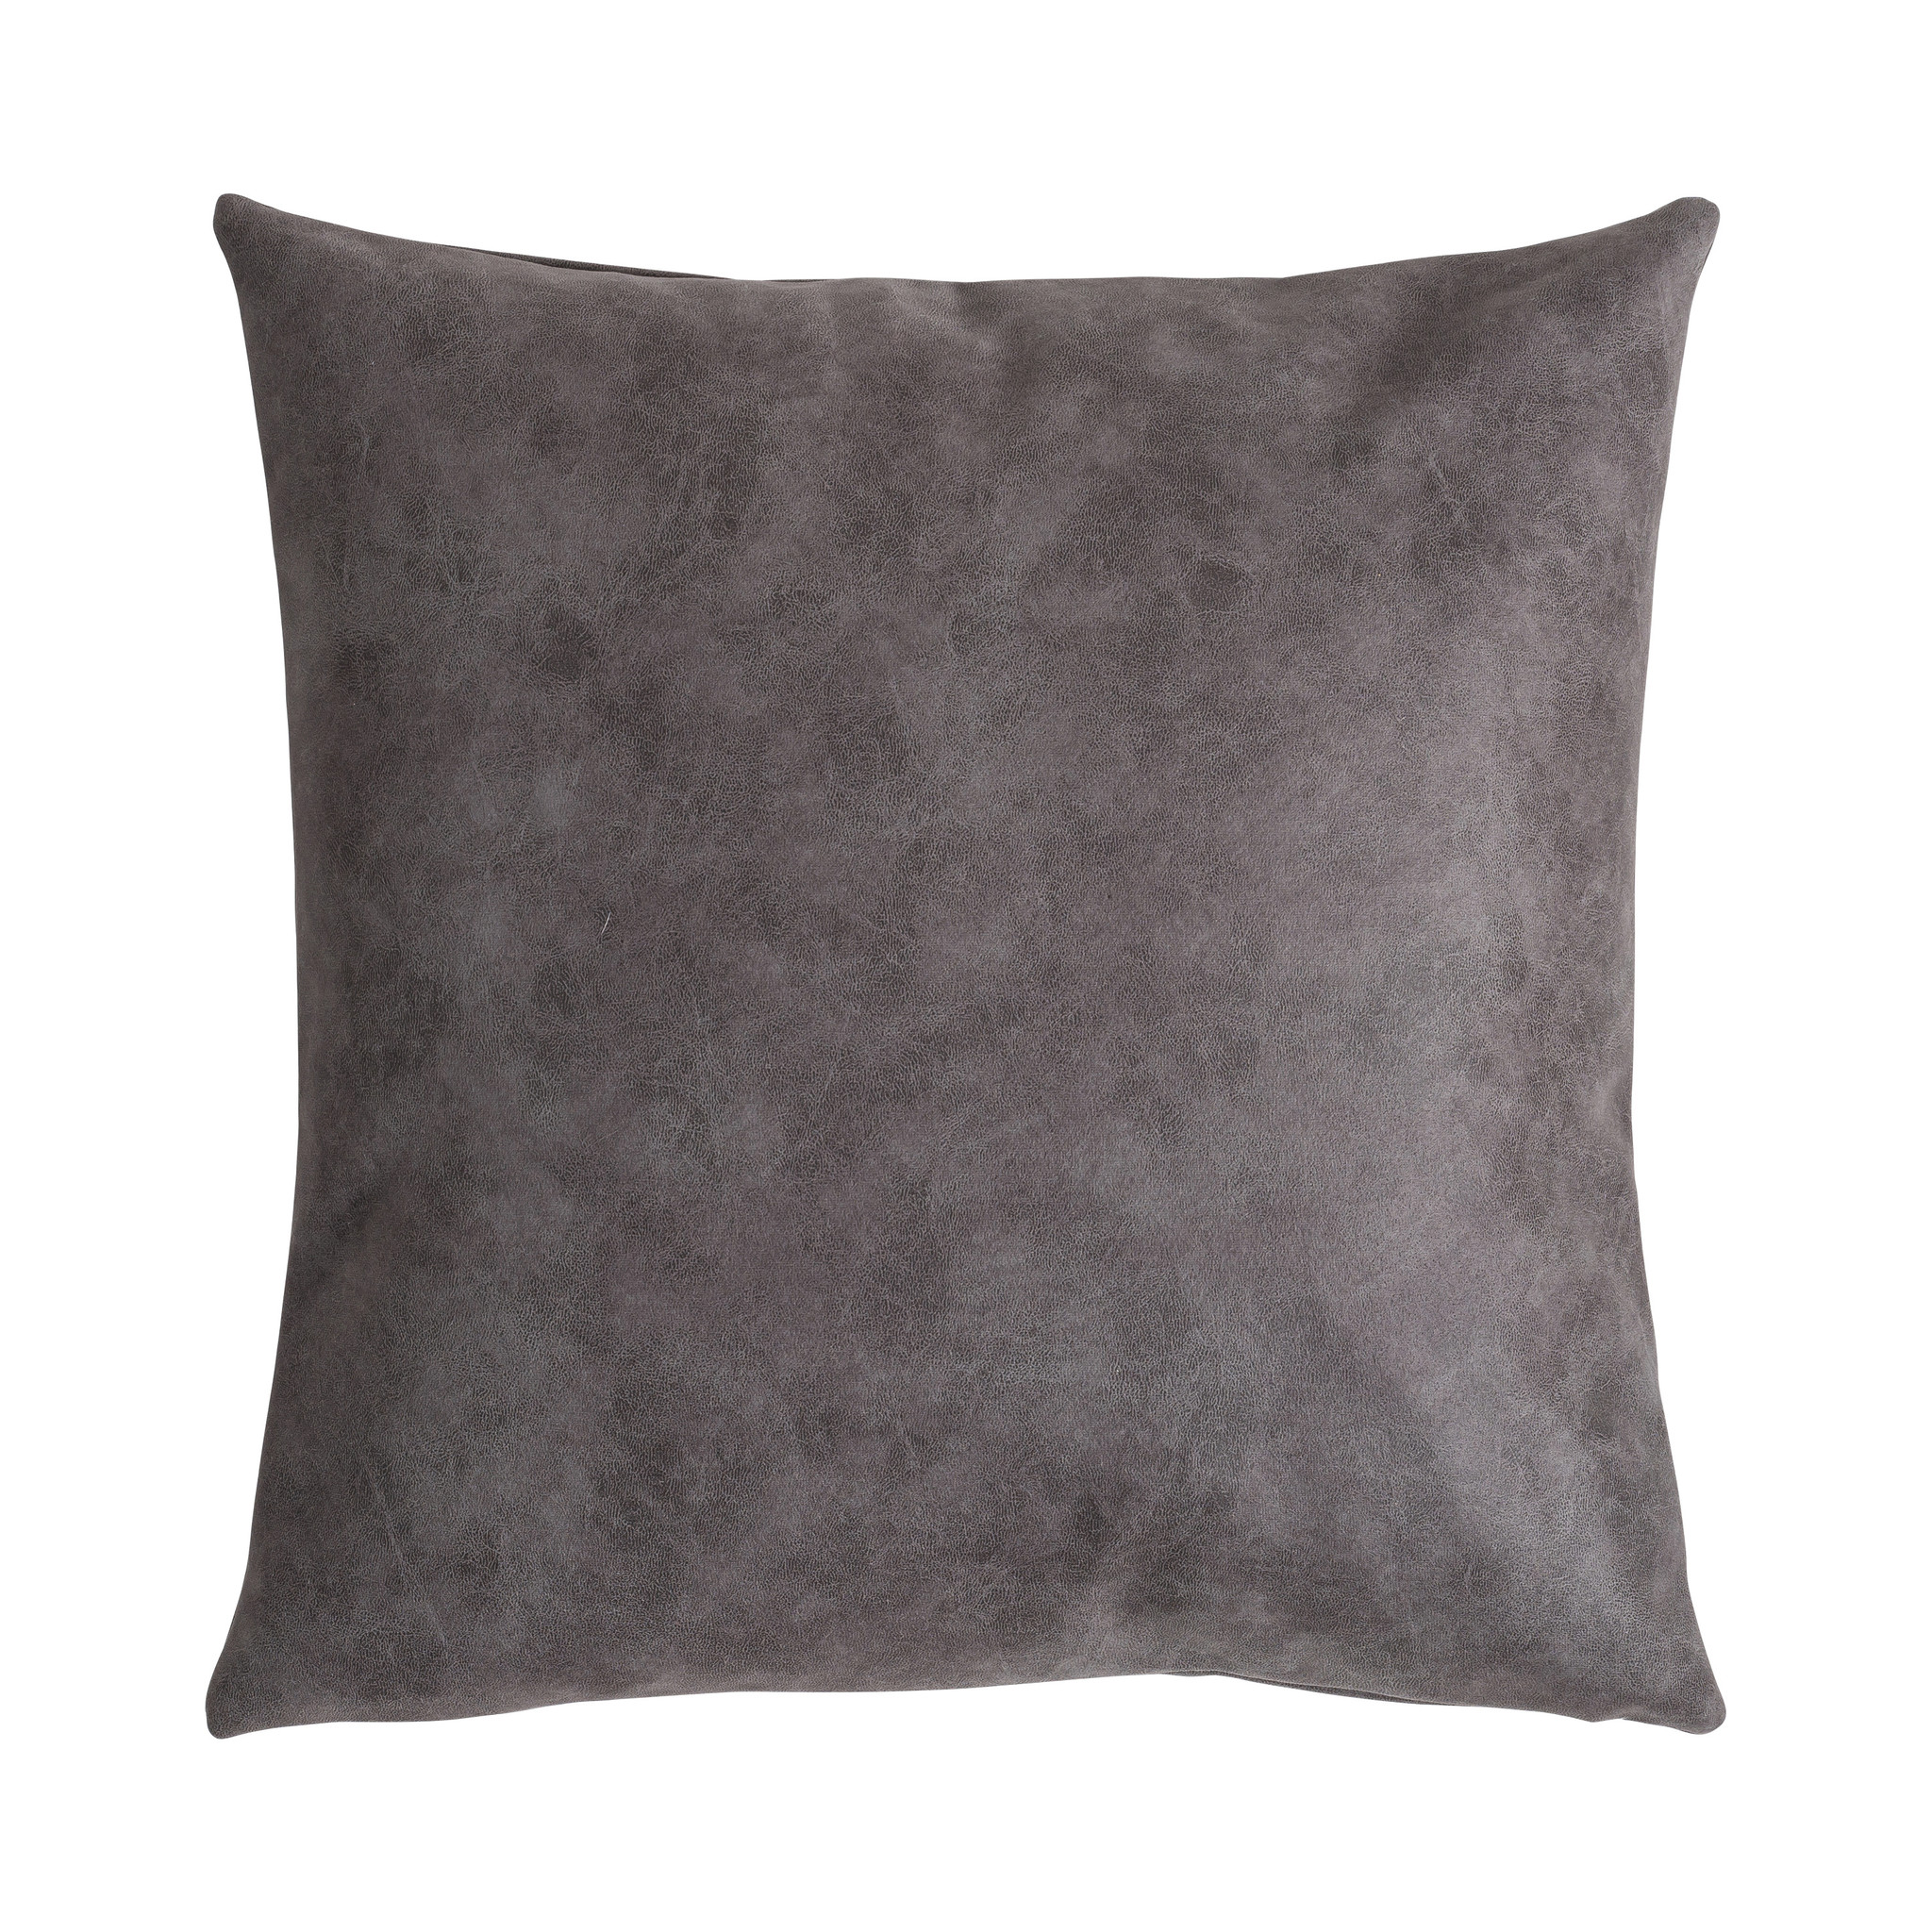 Presence Sierkussenhoes Zonca - Zilver 60 x 60 cm